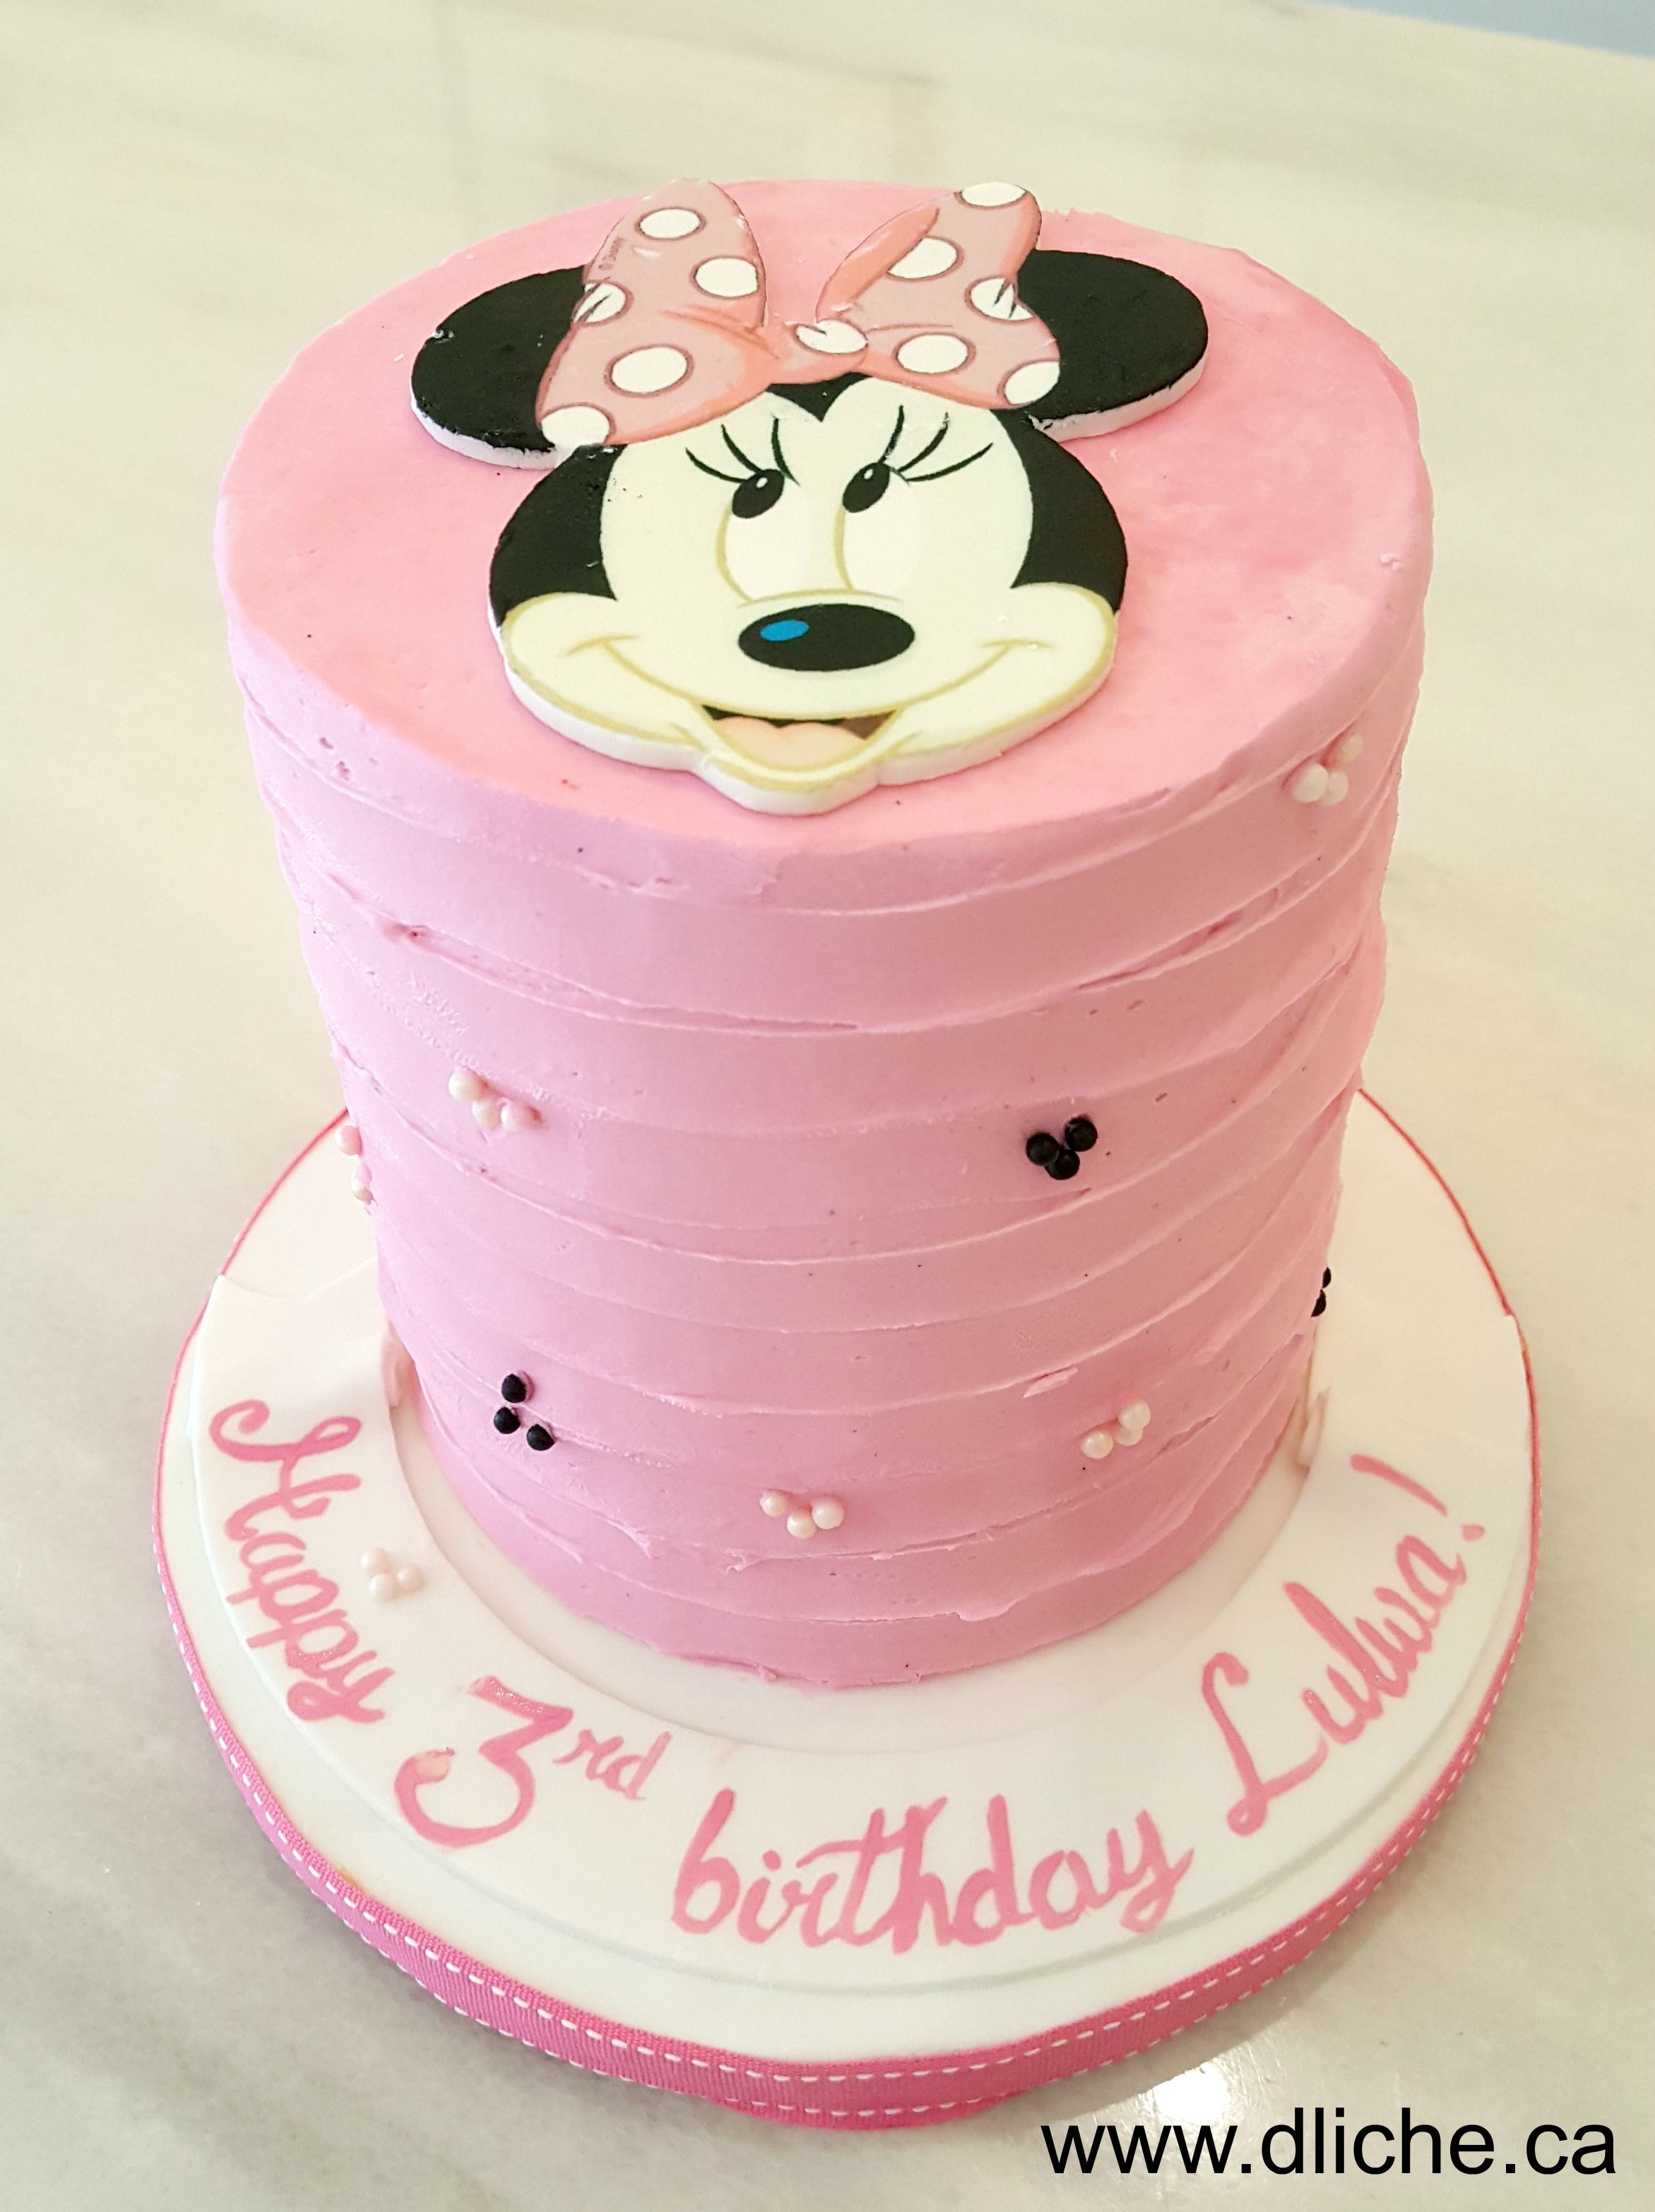 Minnie Mouse cake | Simplement D Liche Cupcakes & Cakes | Pinterest ...